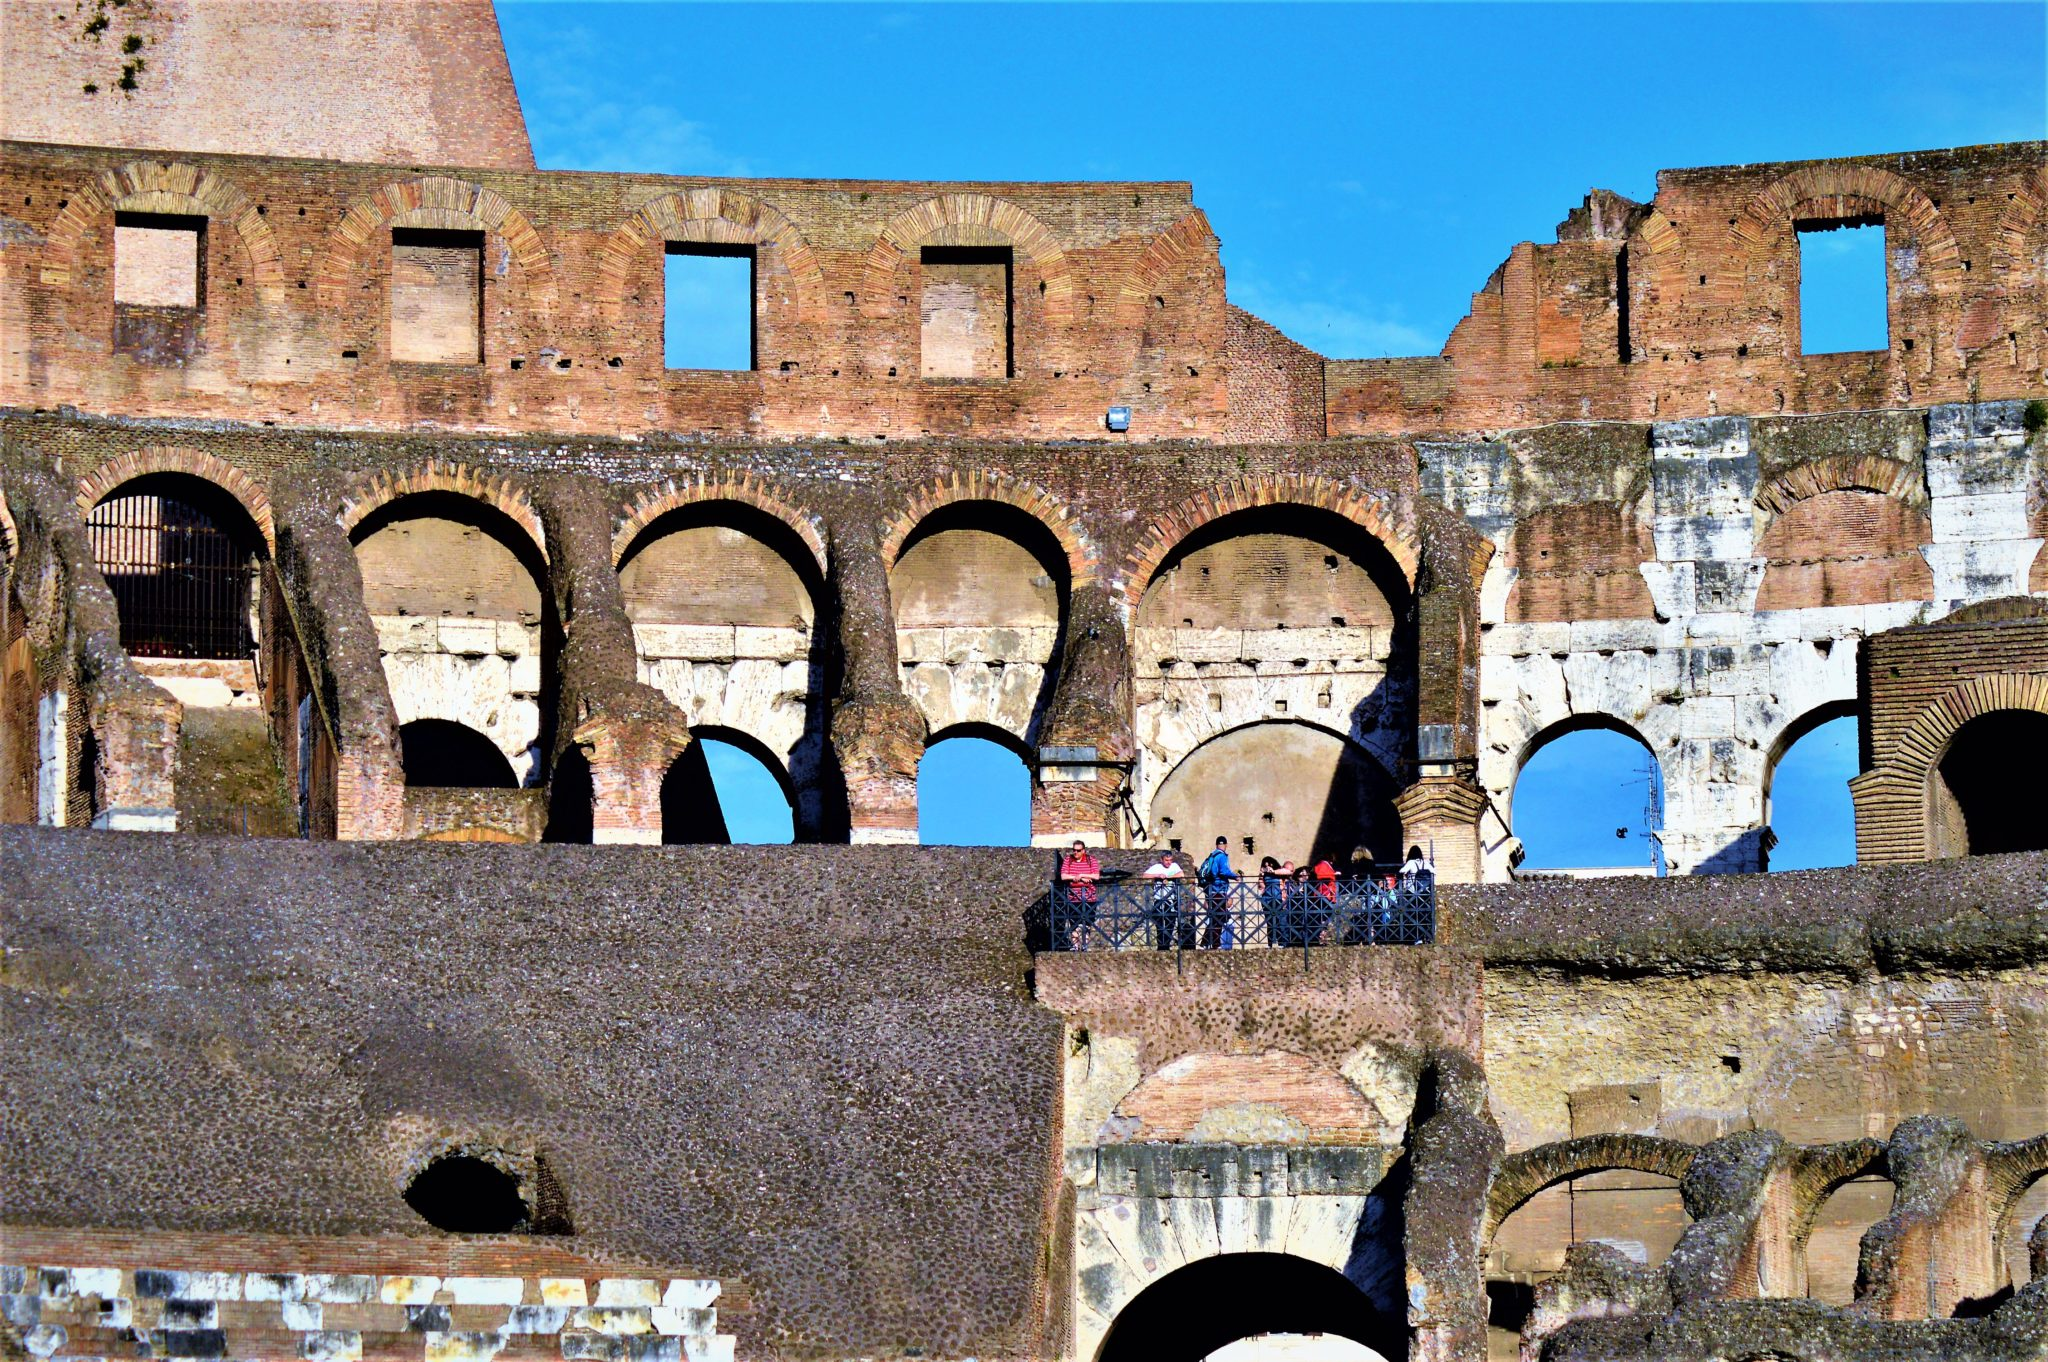 Tourists inside the Roman Colosseum, Rome, Italy